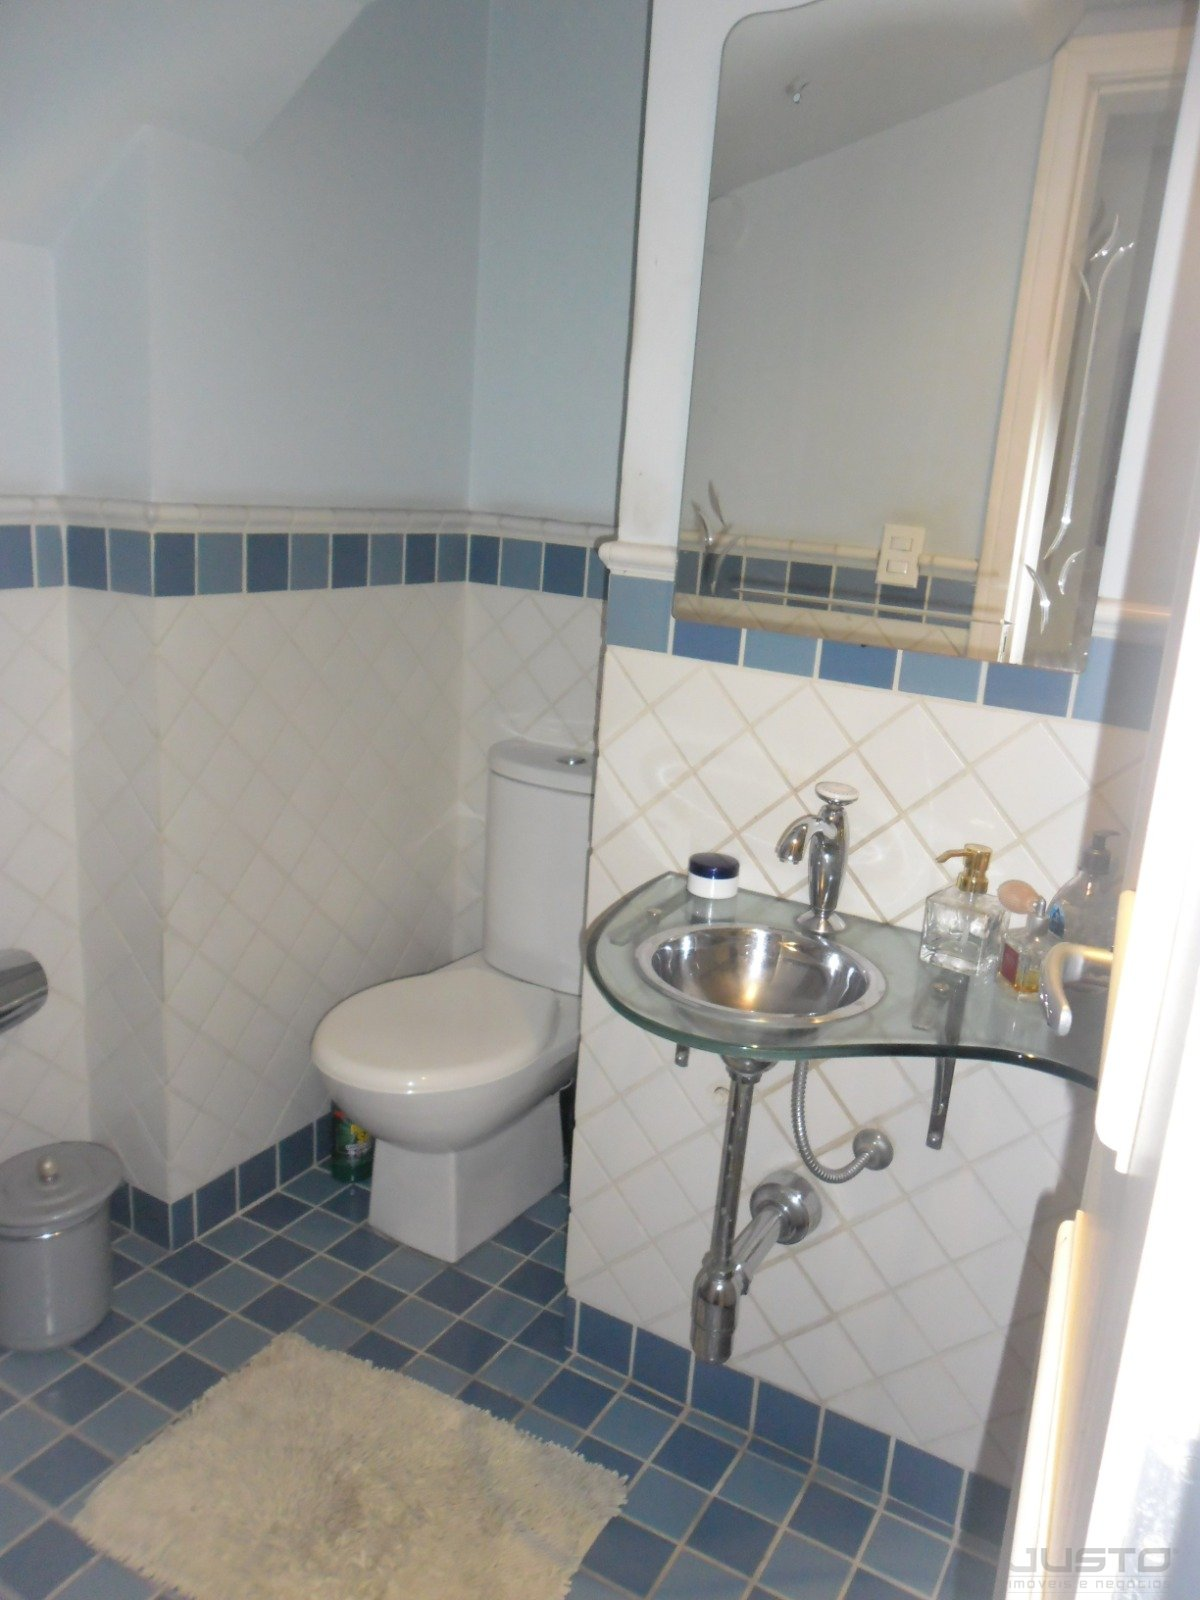 06 lavabo